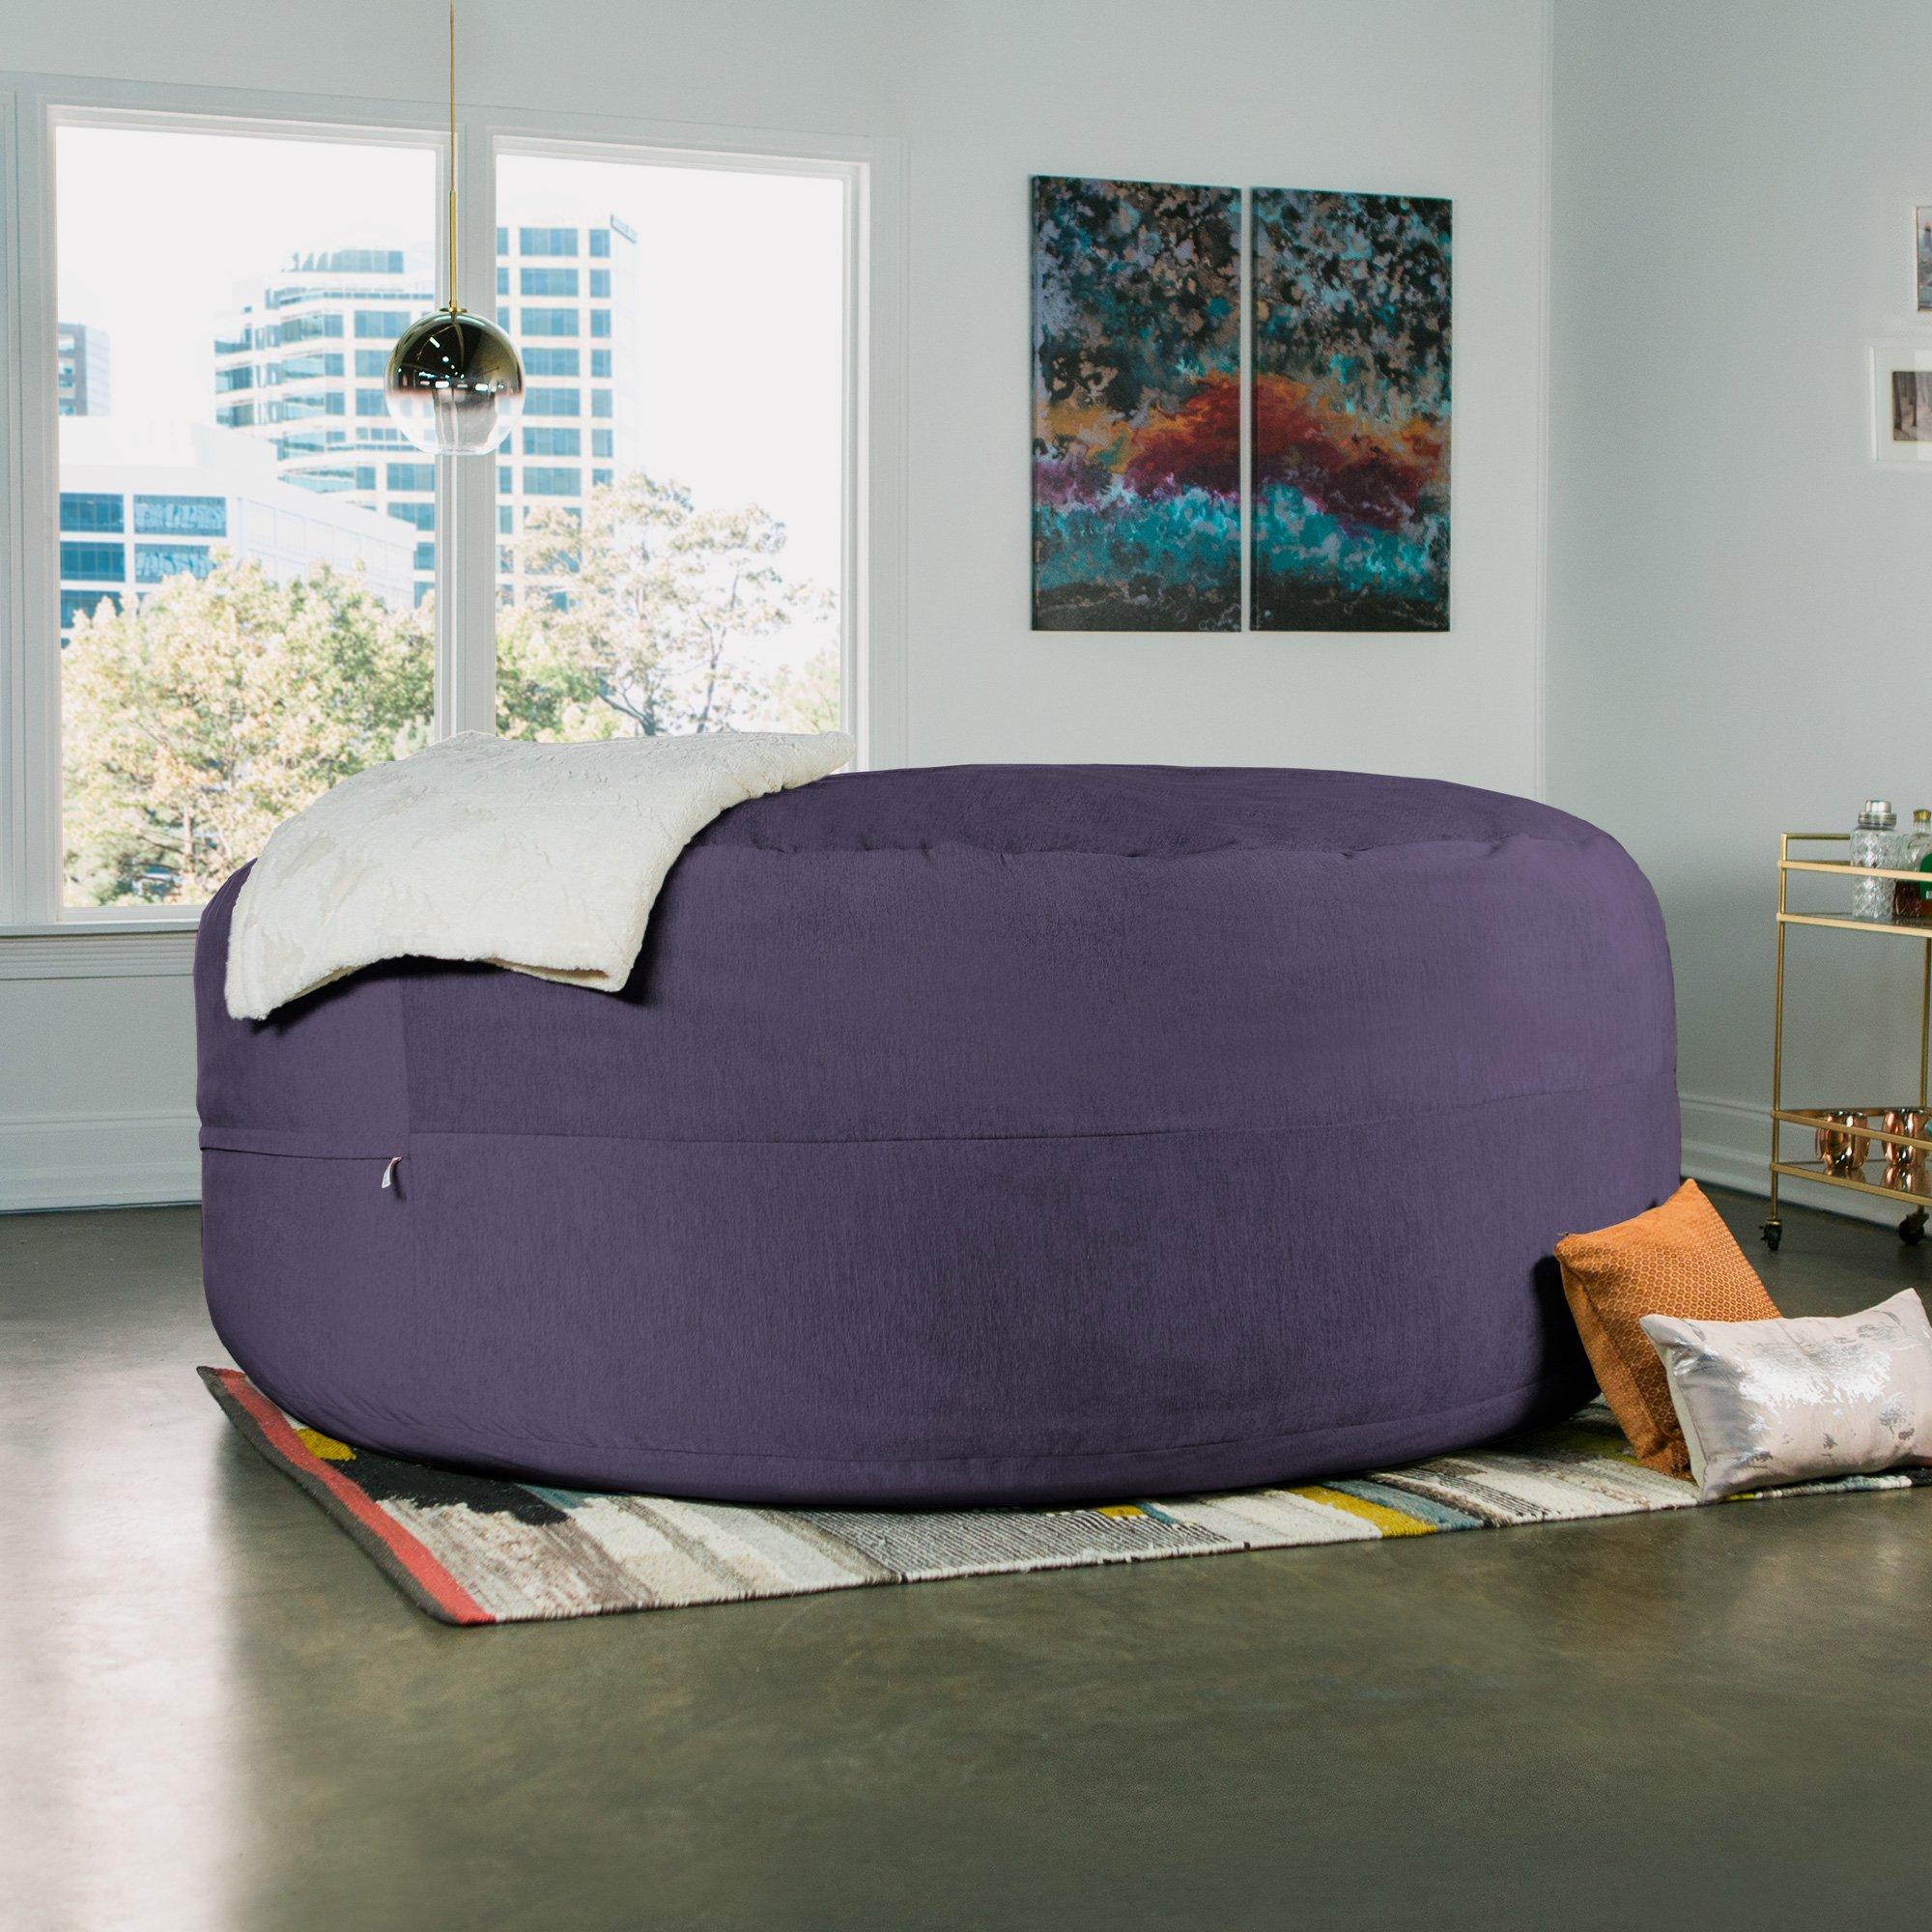 Jaxx Cocoon 8 Foot Huge Sleeper Bean Bag Bed - Chenille, Plum by Jaxx (Image #8)